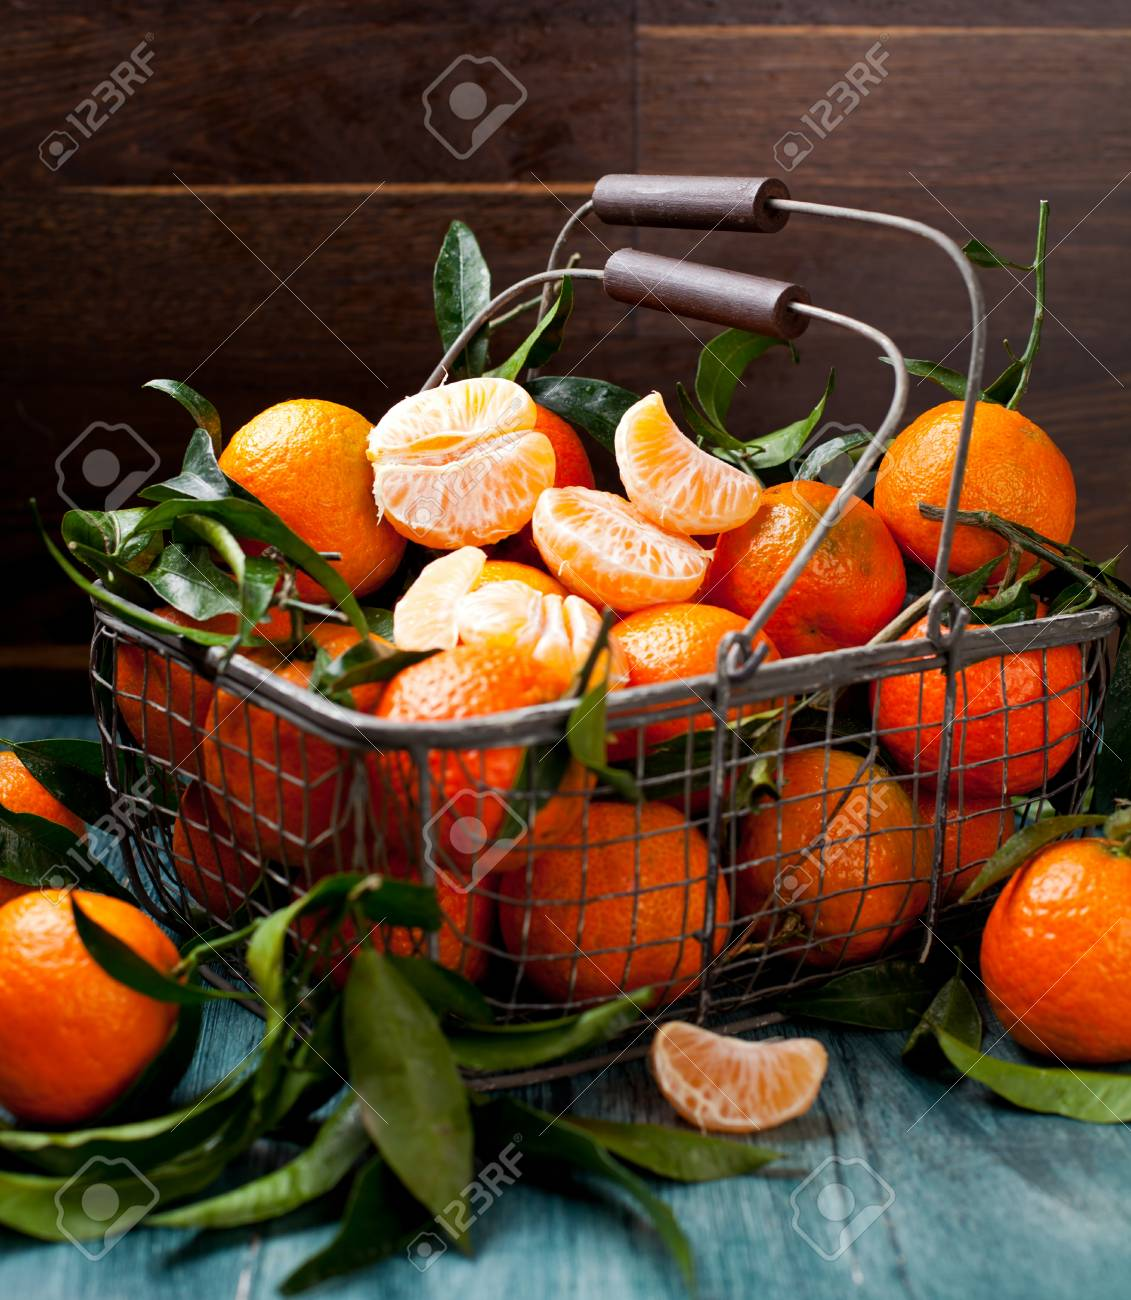 Fresh picked mandarins on wooden background closeup - 113664225